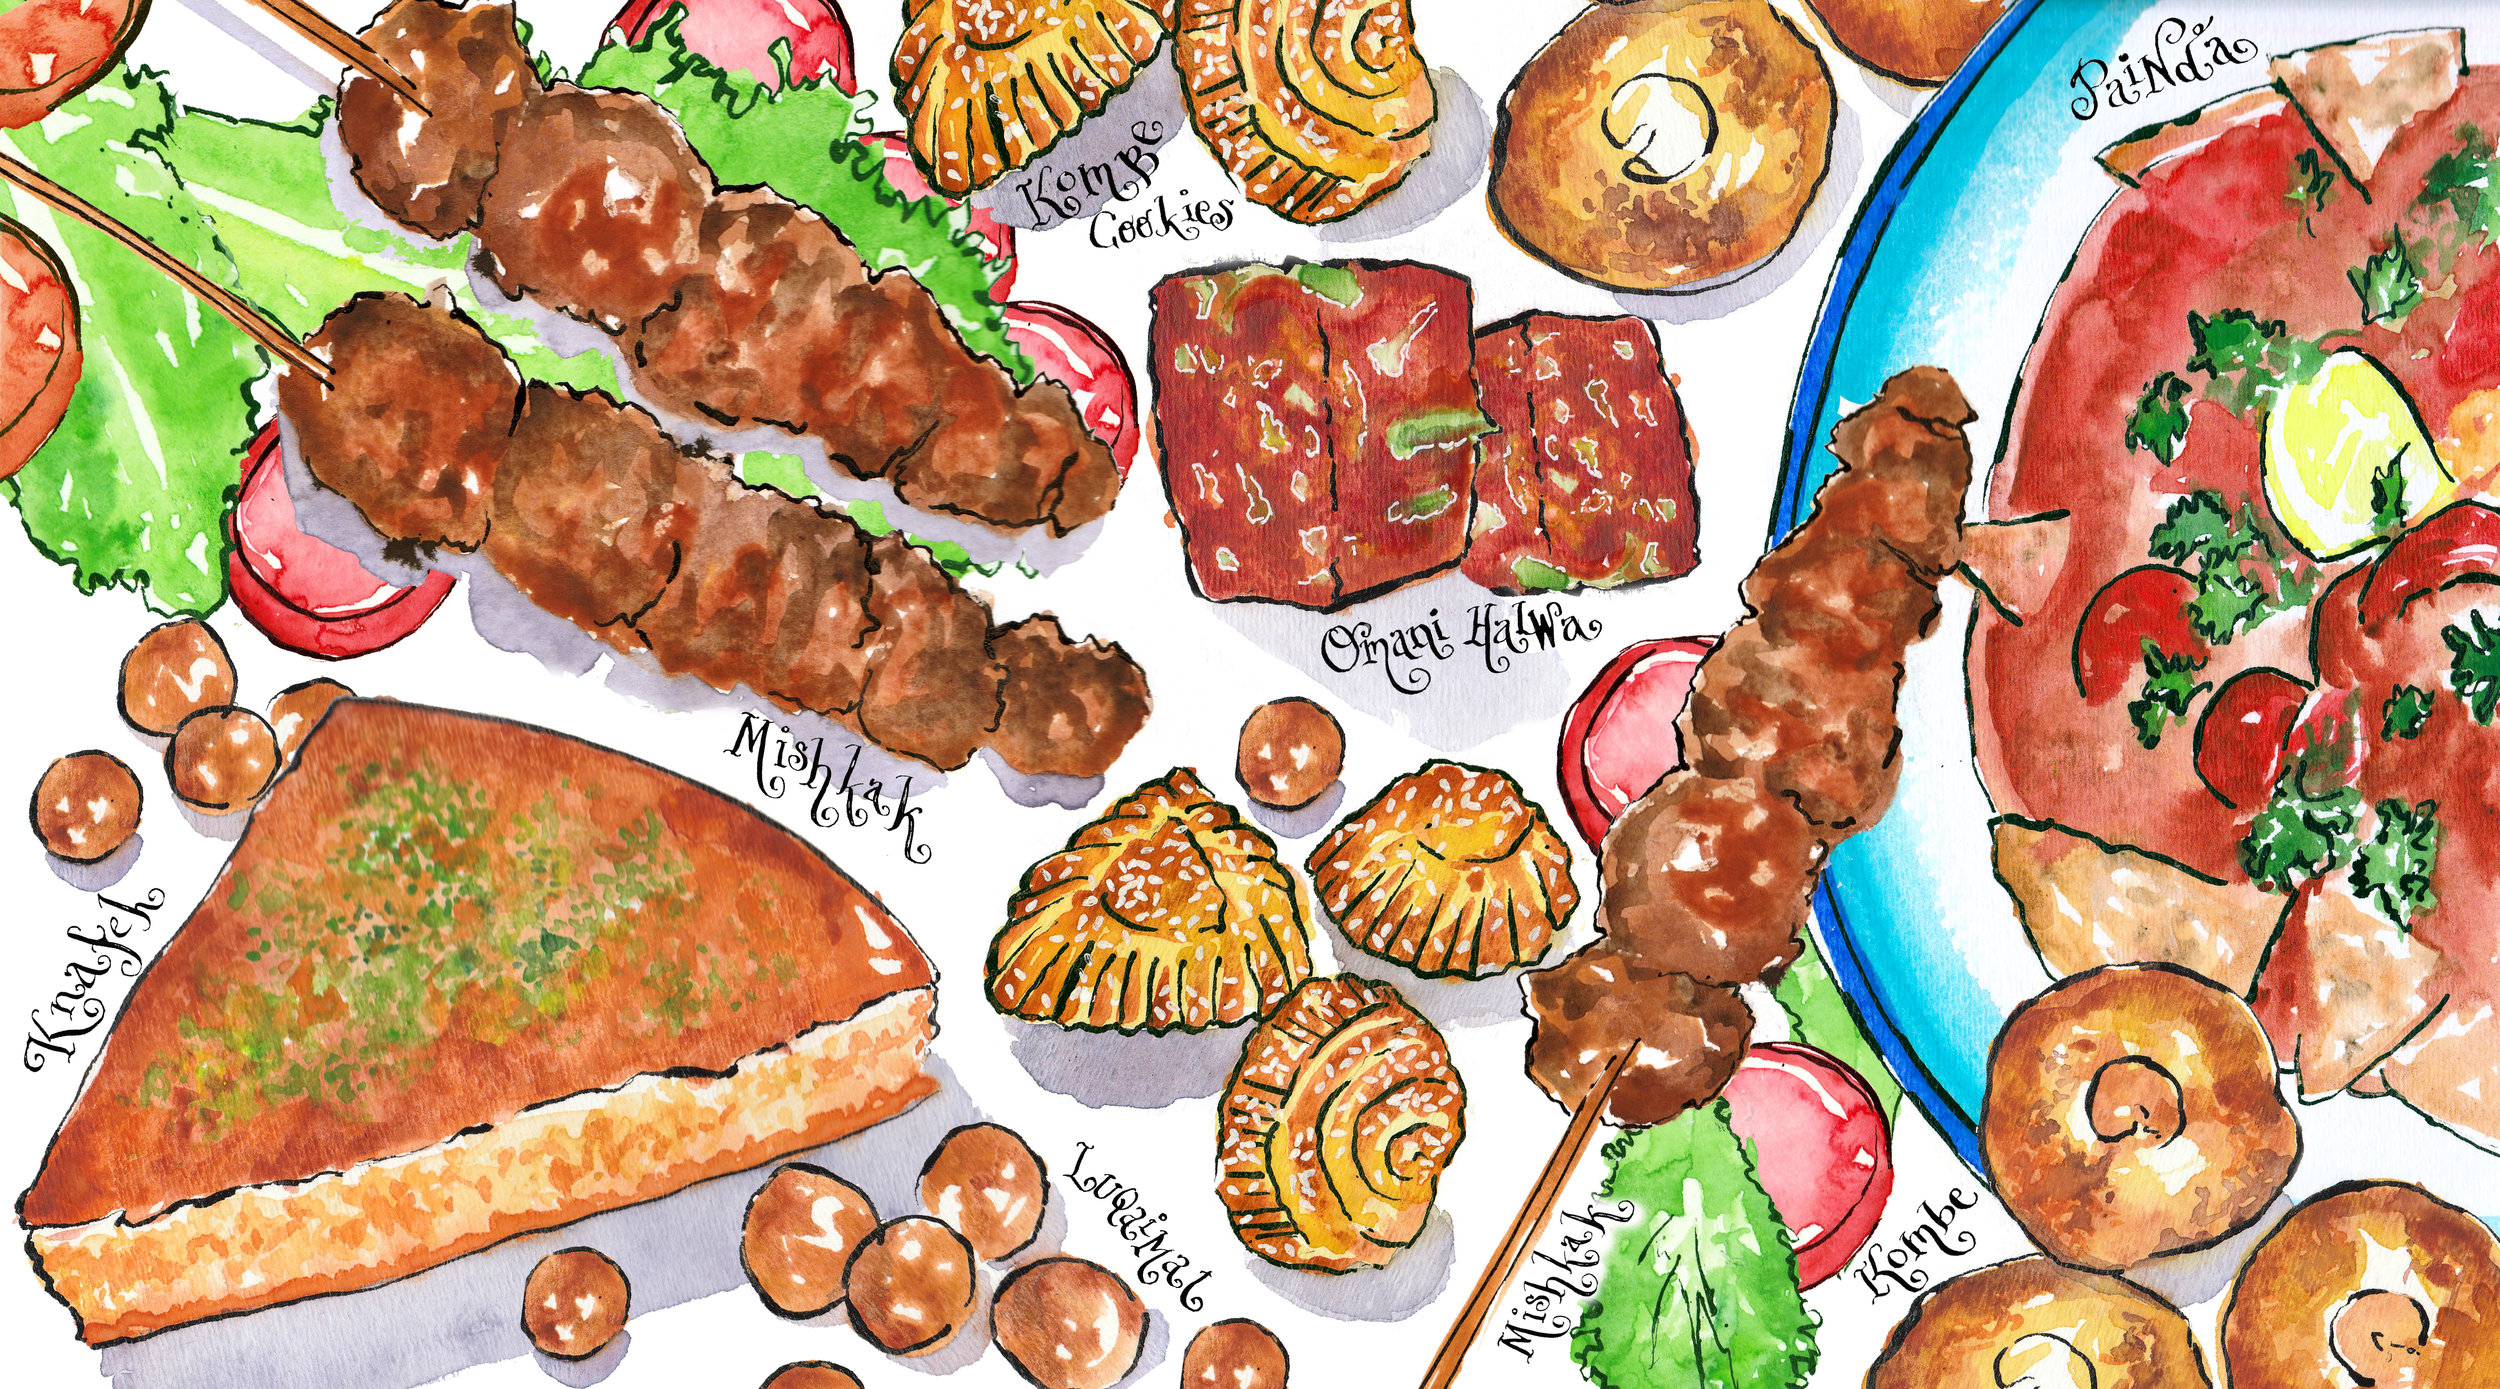 Illustration by Doodlenomics.